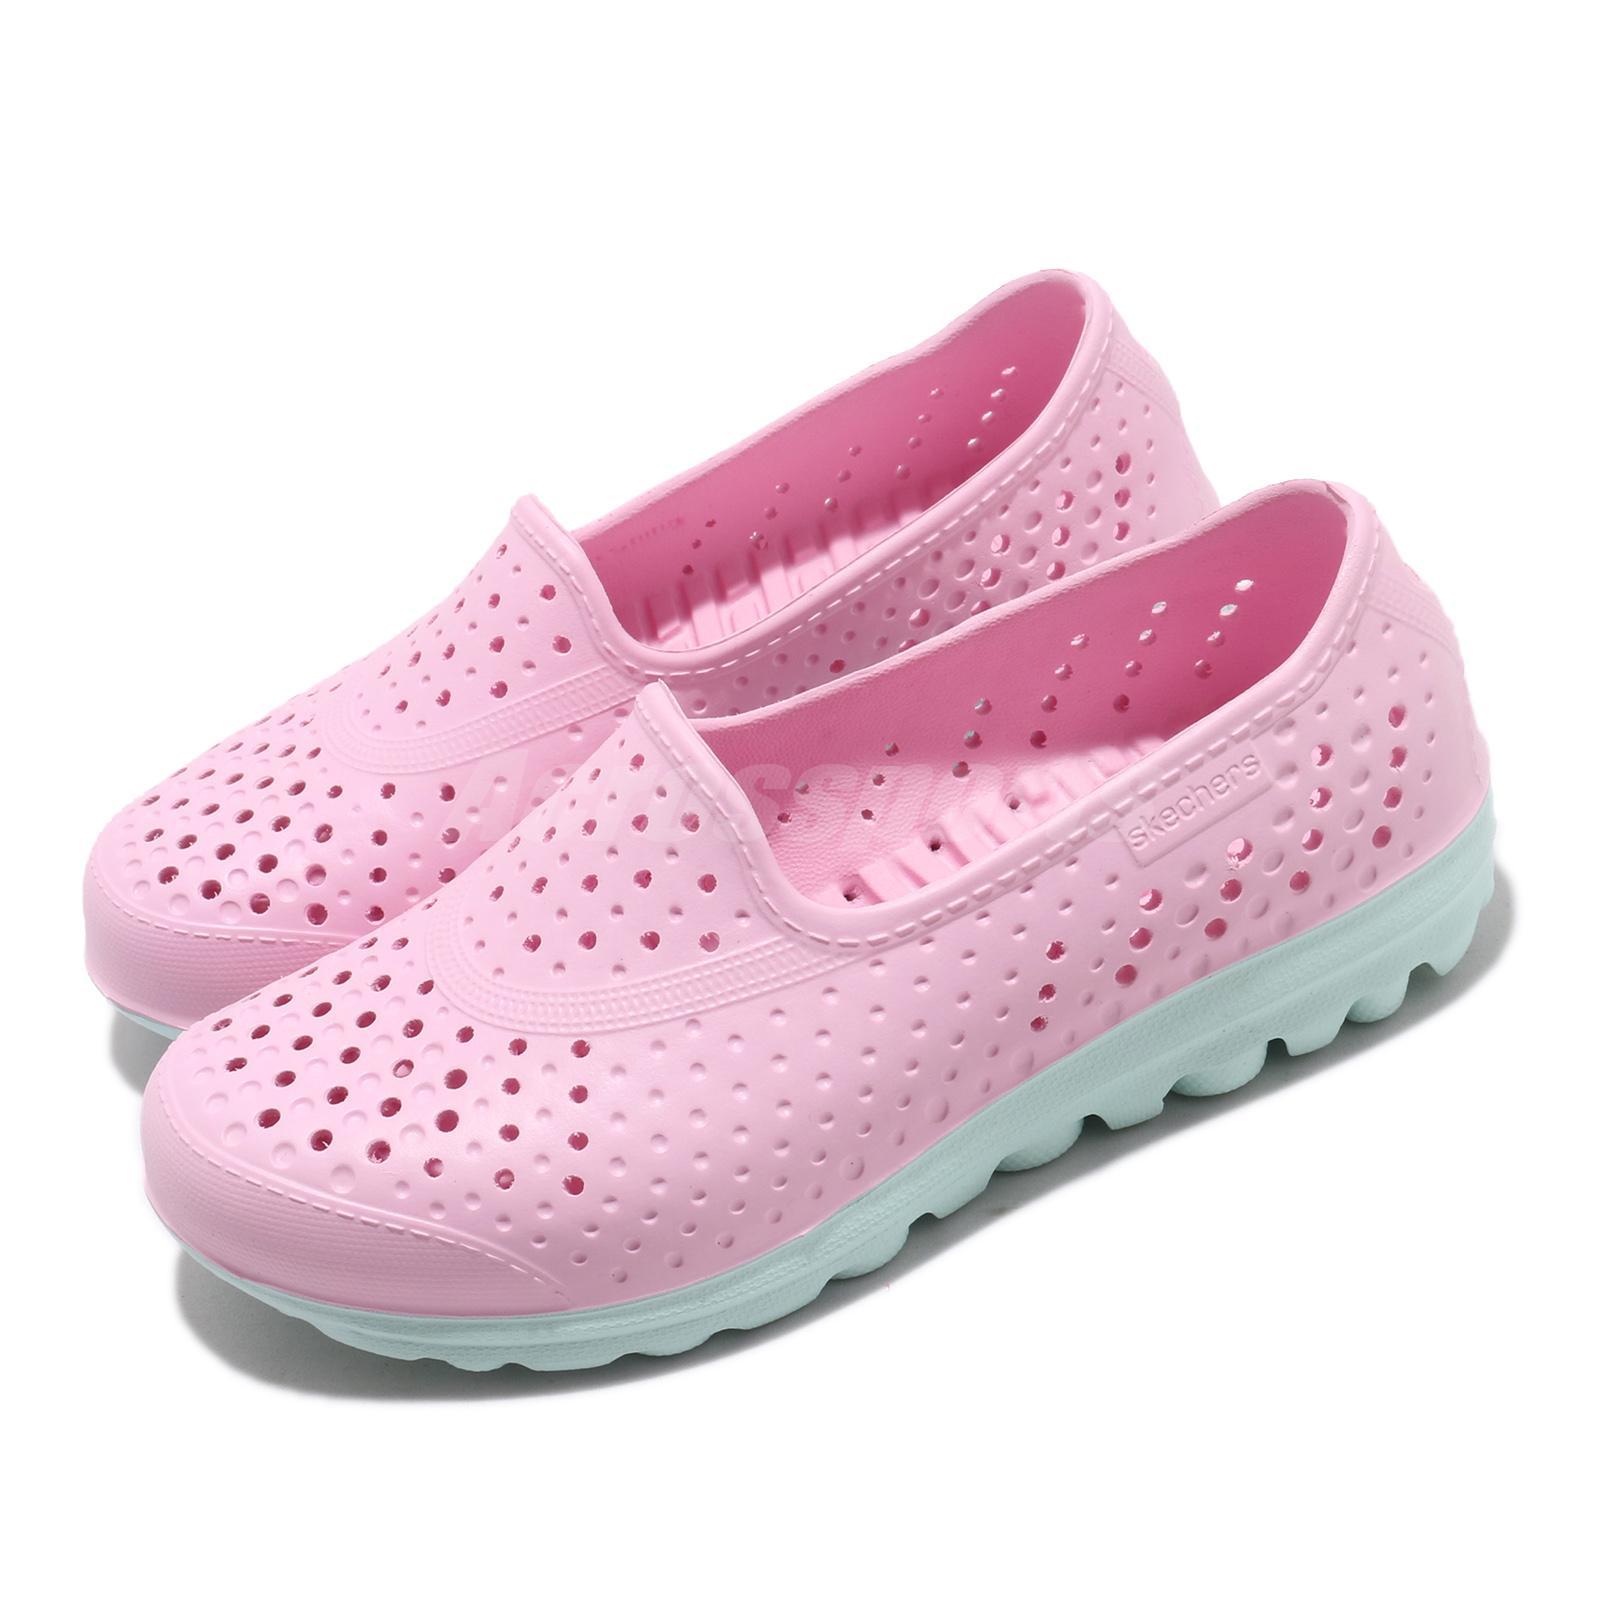 Mascotas mediodía recurso  Skechers H2GO-Waterlillys Pink Light Blue Kid Preschool Loafers Shoe  86622L-PKLB | eBay